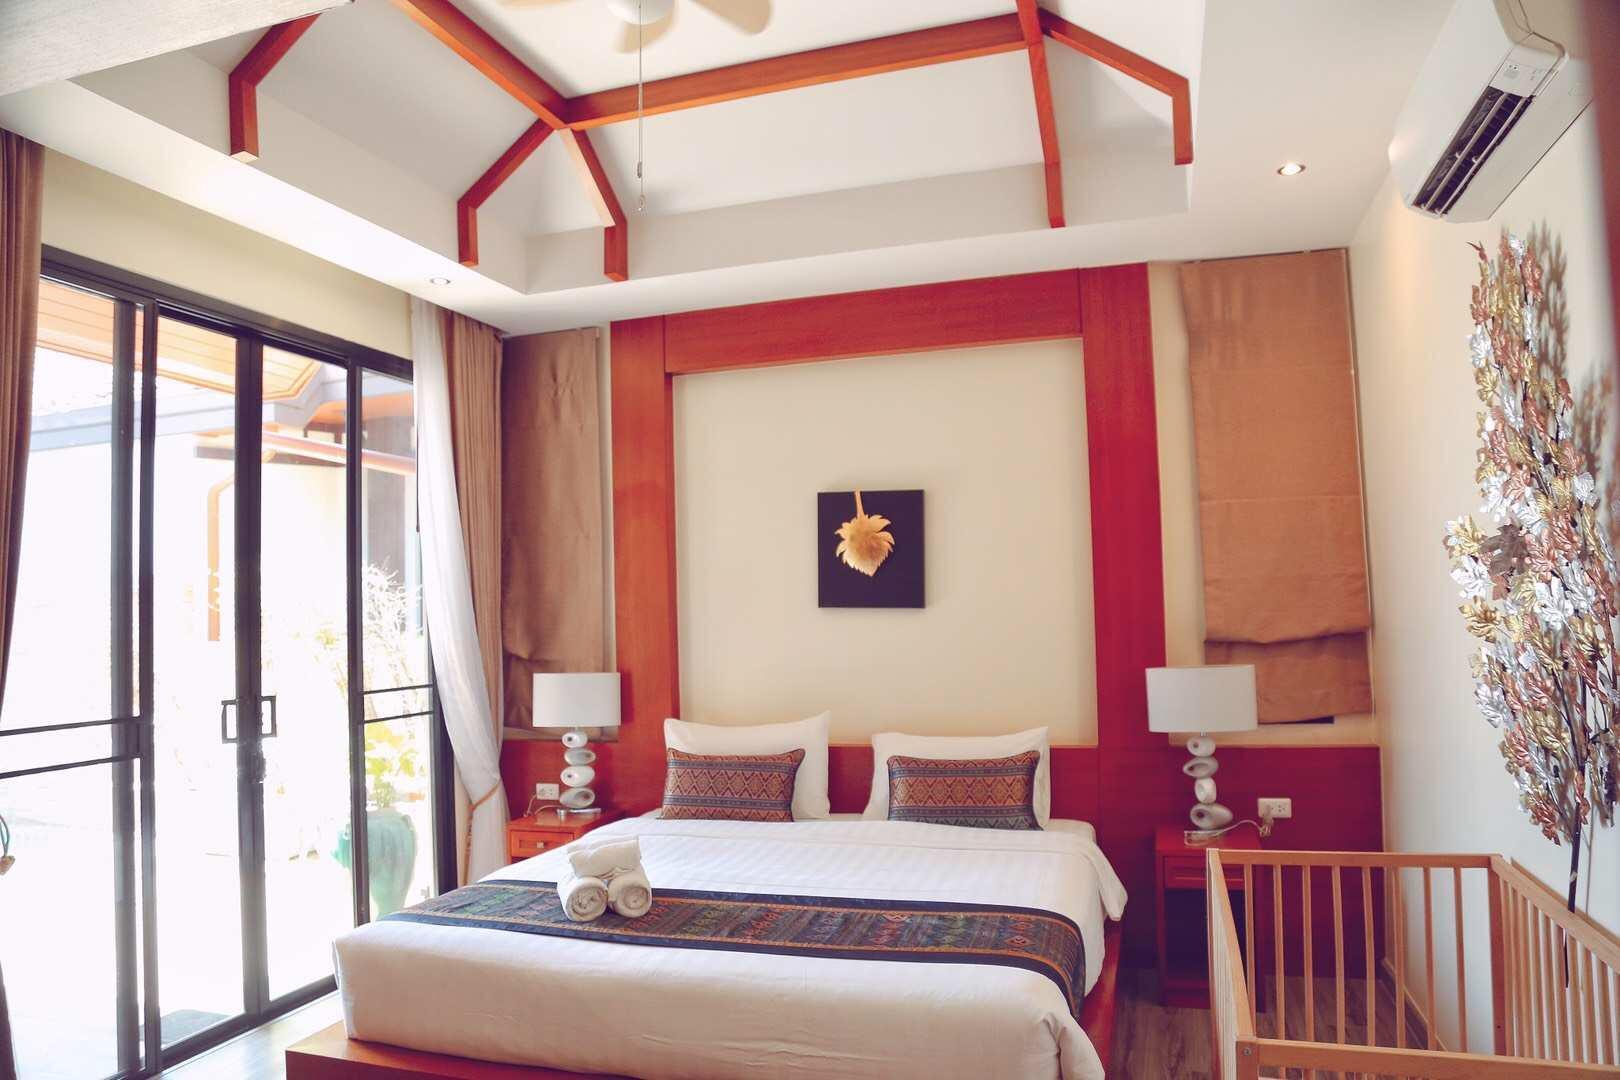 Rawai Luxury Villa (5 minutes walk to Rawai Beach) วิลลา 2 ห้องนอน 2 ห้องน้ำส่วนตัว ขนาด 150 ตร.ม. – หาดราไวย์